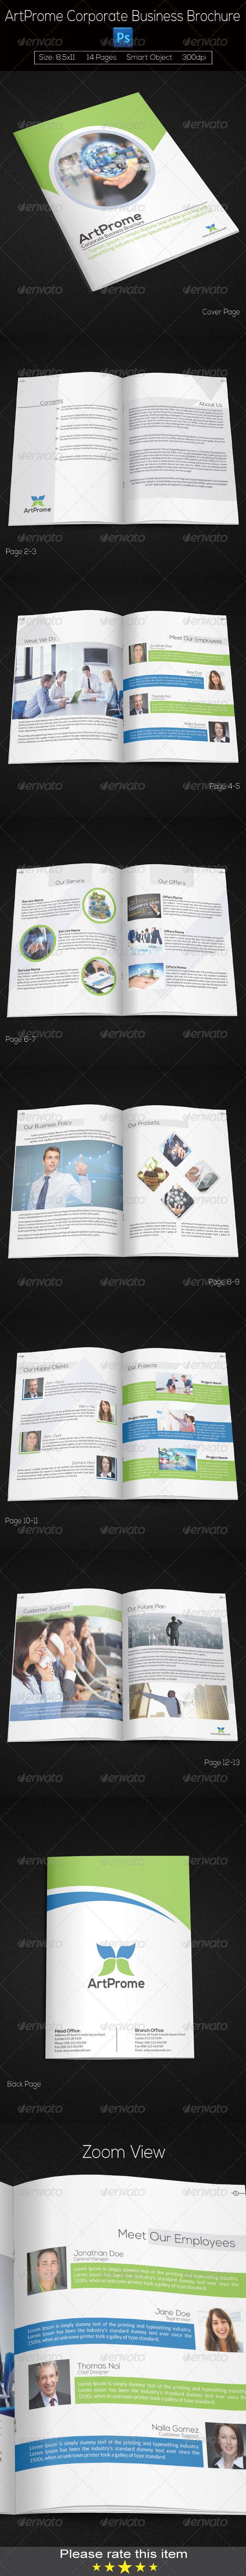 GraphicRiver Corporate Business Brochure 7785156